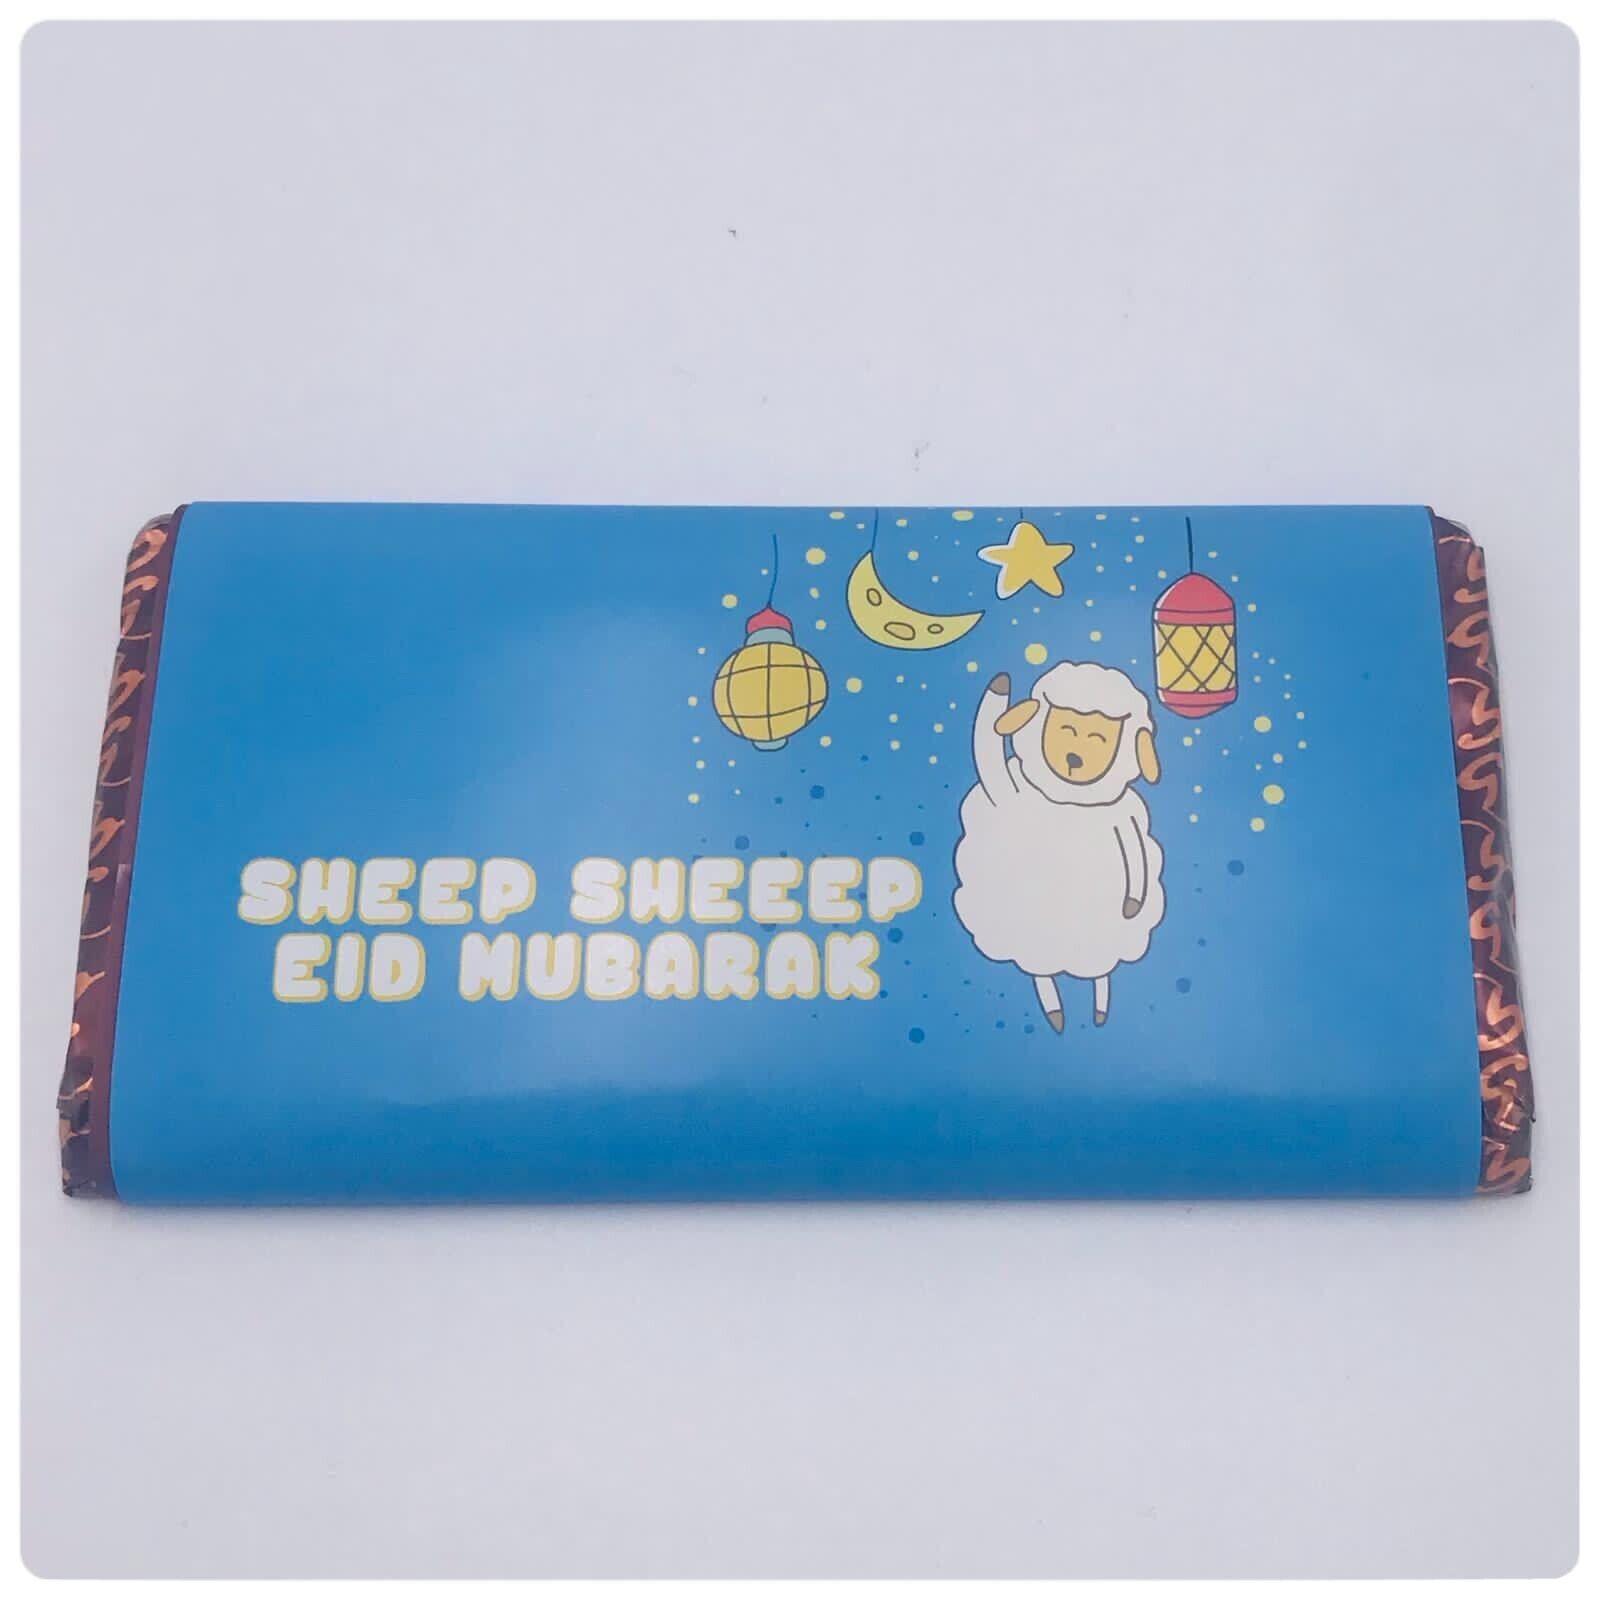 Eid MUBARAK Novedad Envoltura De Chocolate Envoltura de regalo ideal con barra de chocolate